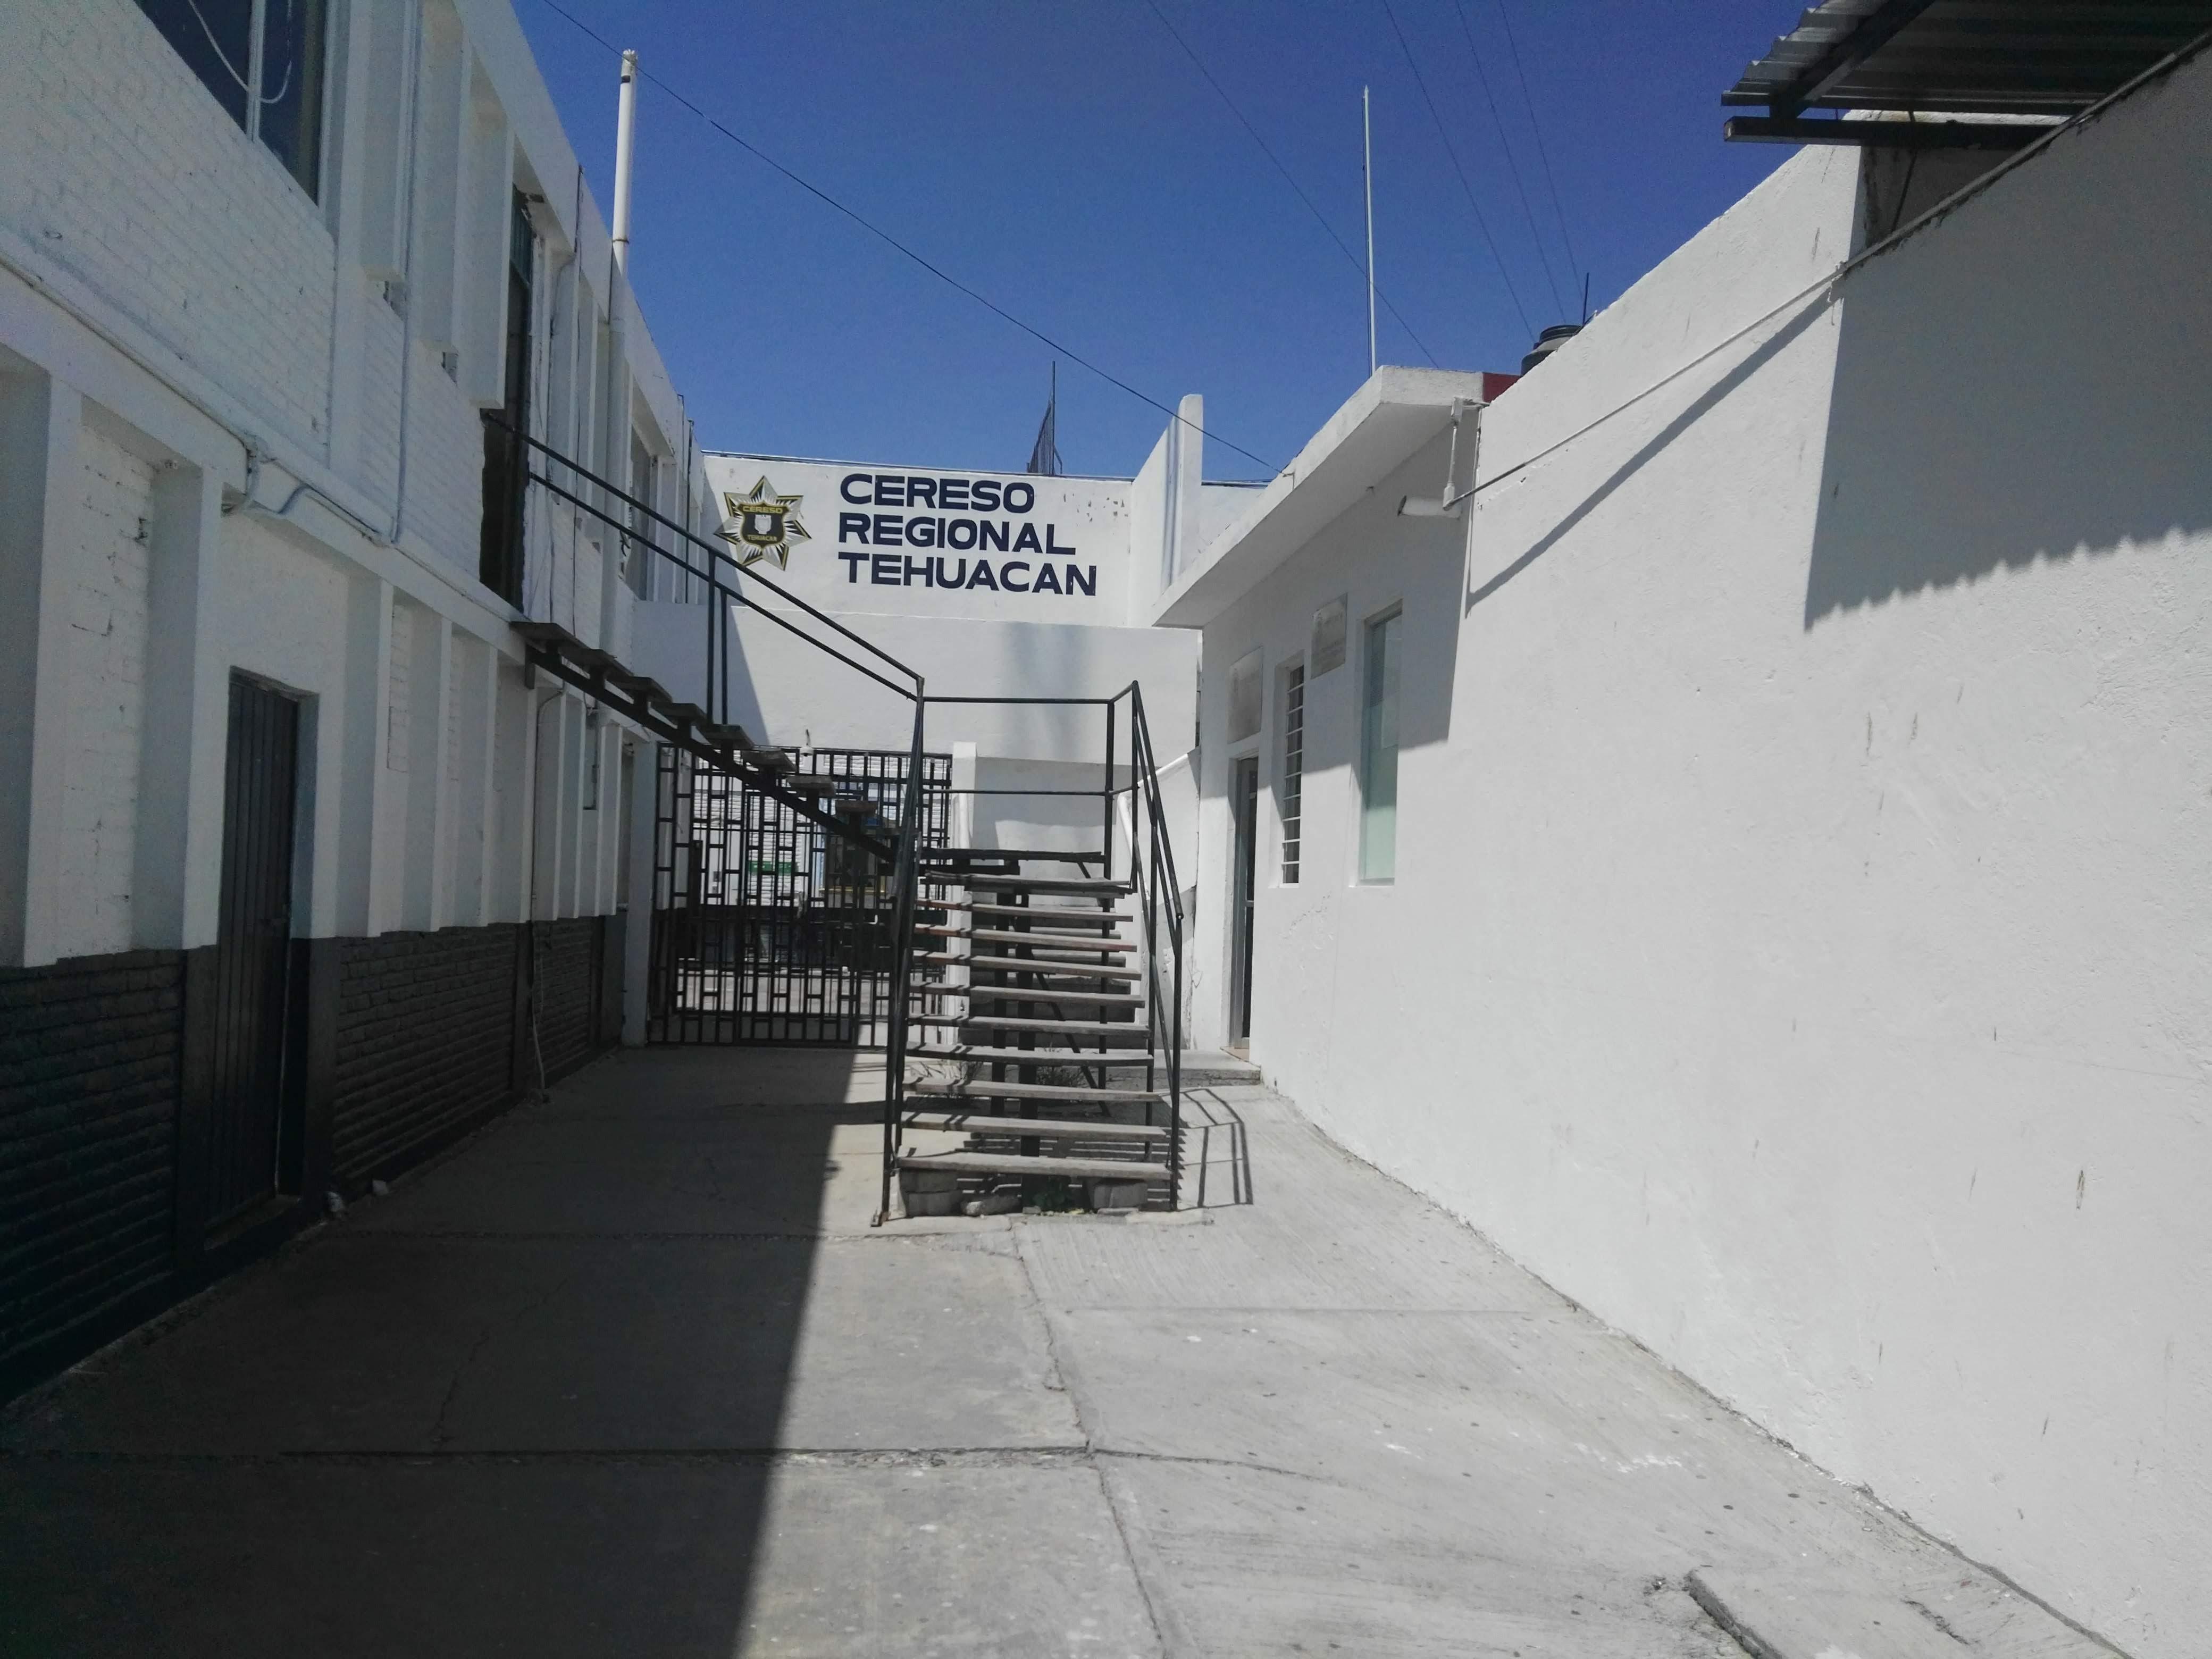 Cereso de Tehuacán no será sanitizado por el momento